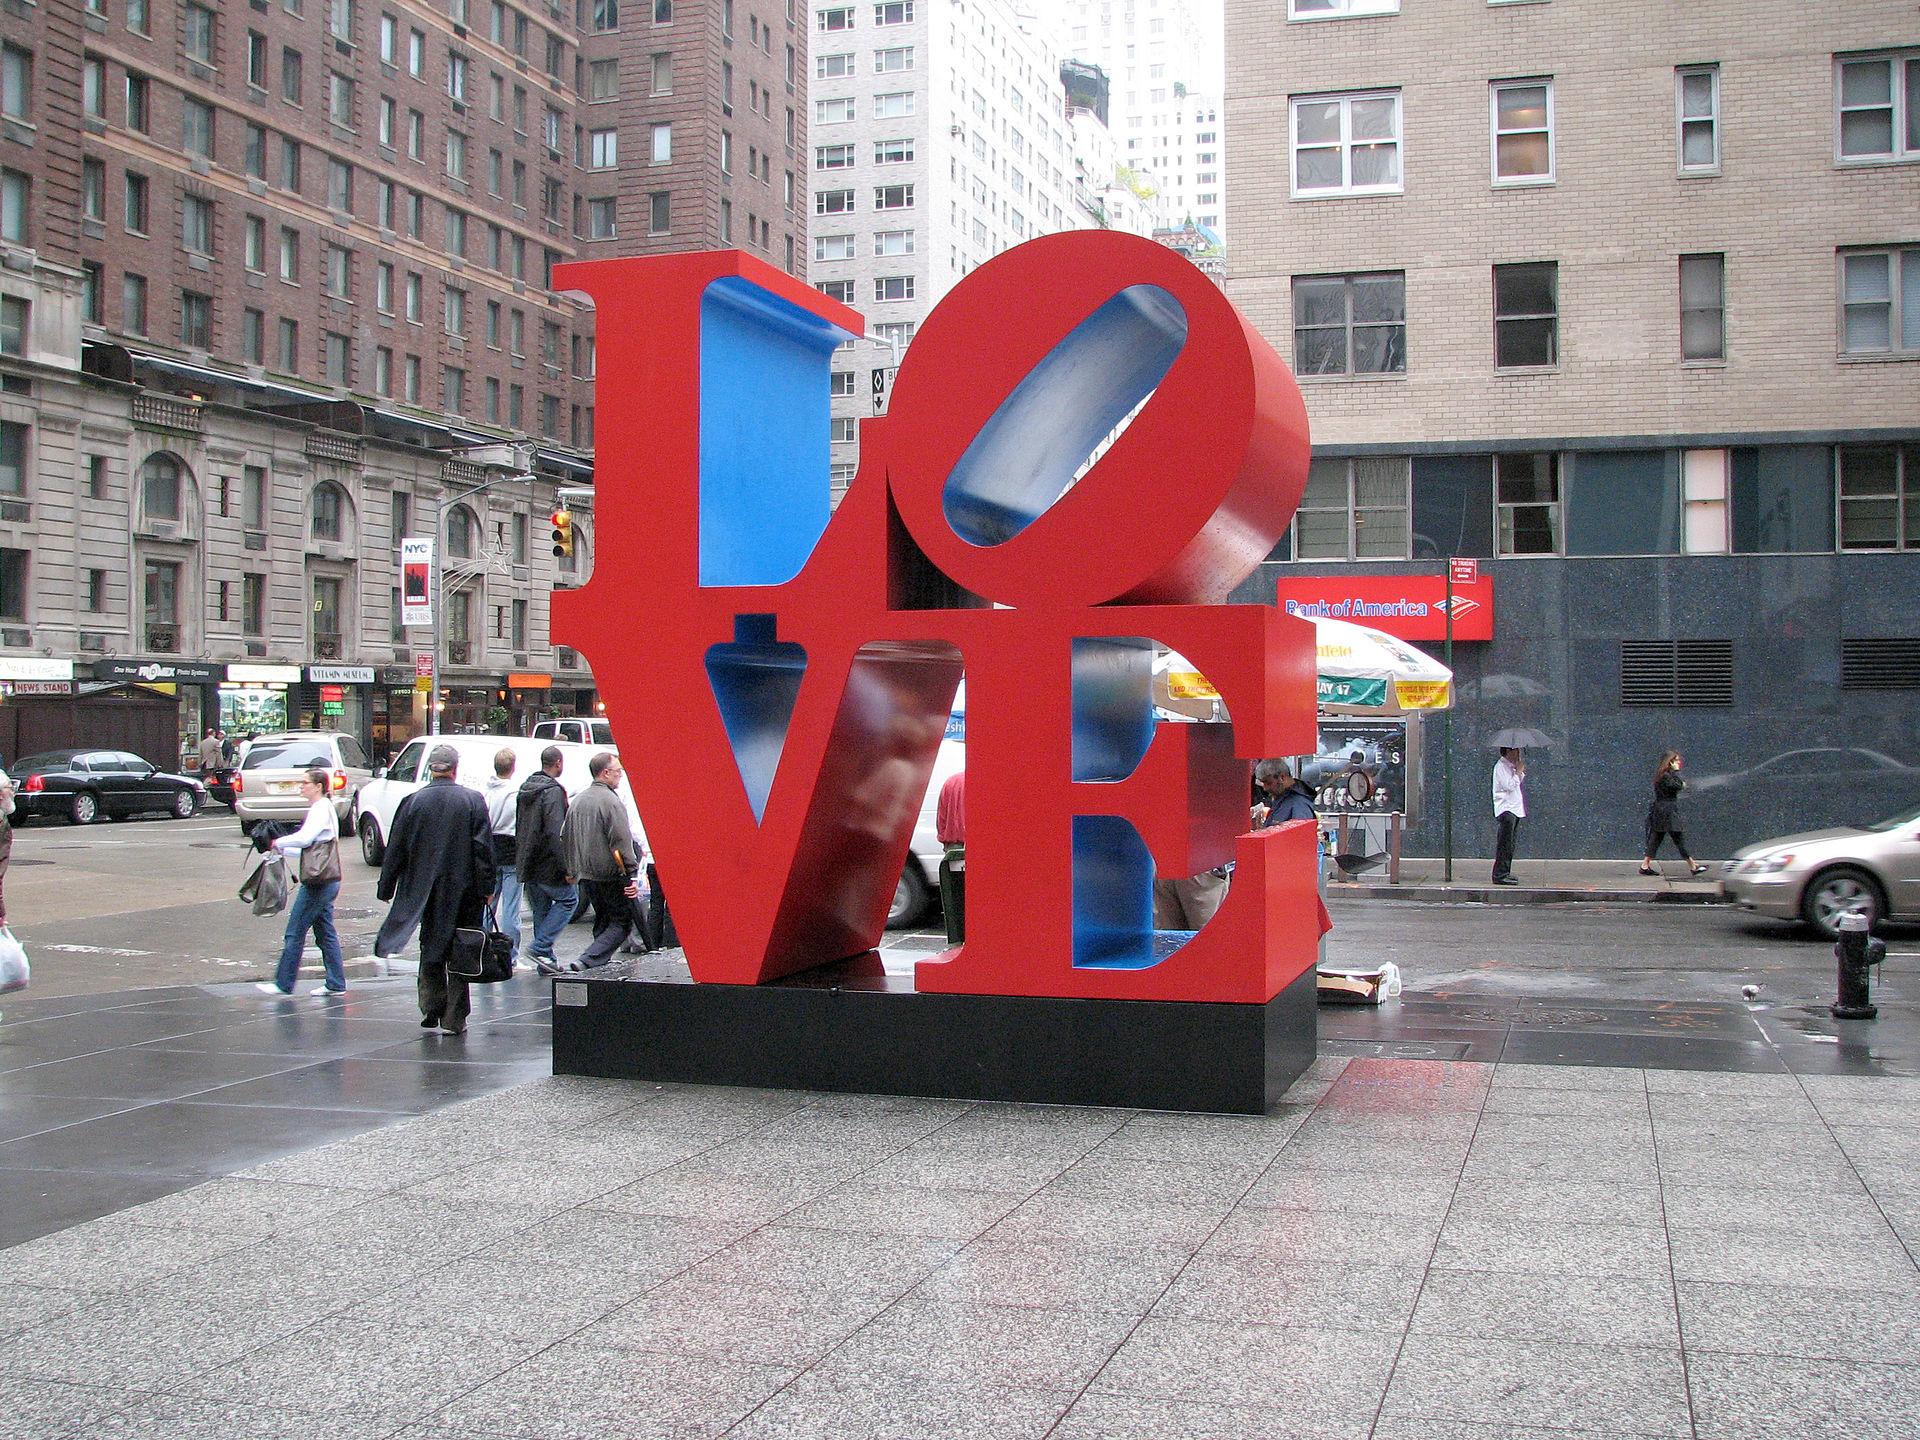 Love Sculpture, Robert Indiana